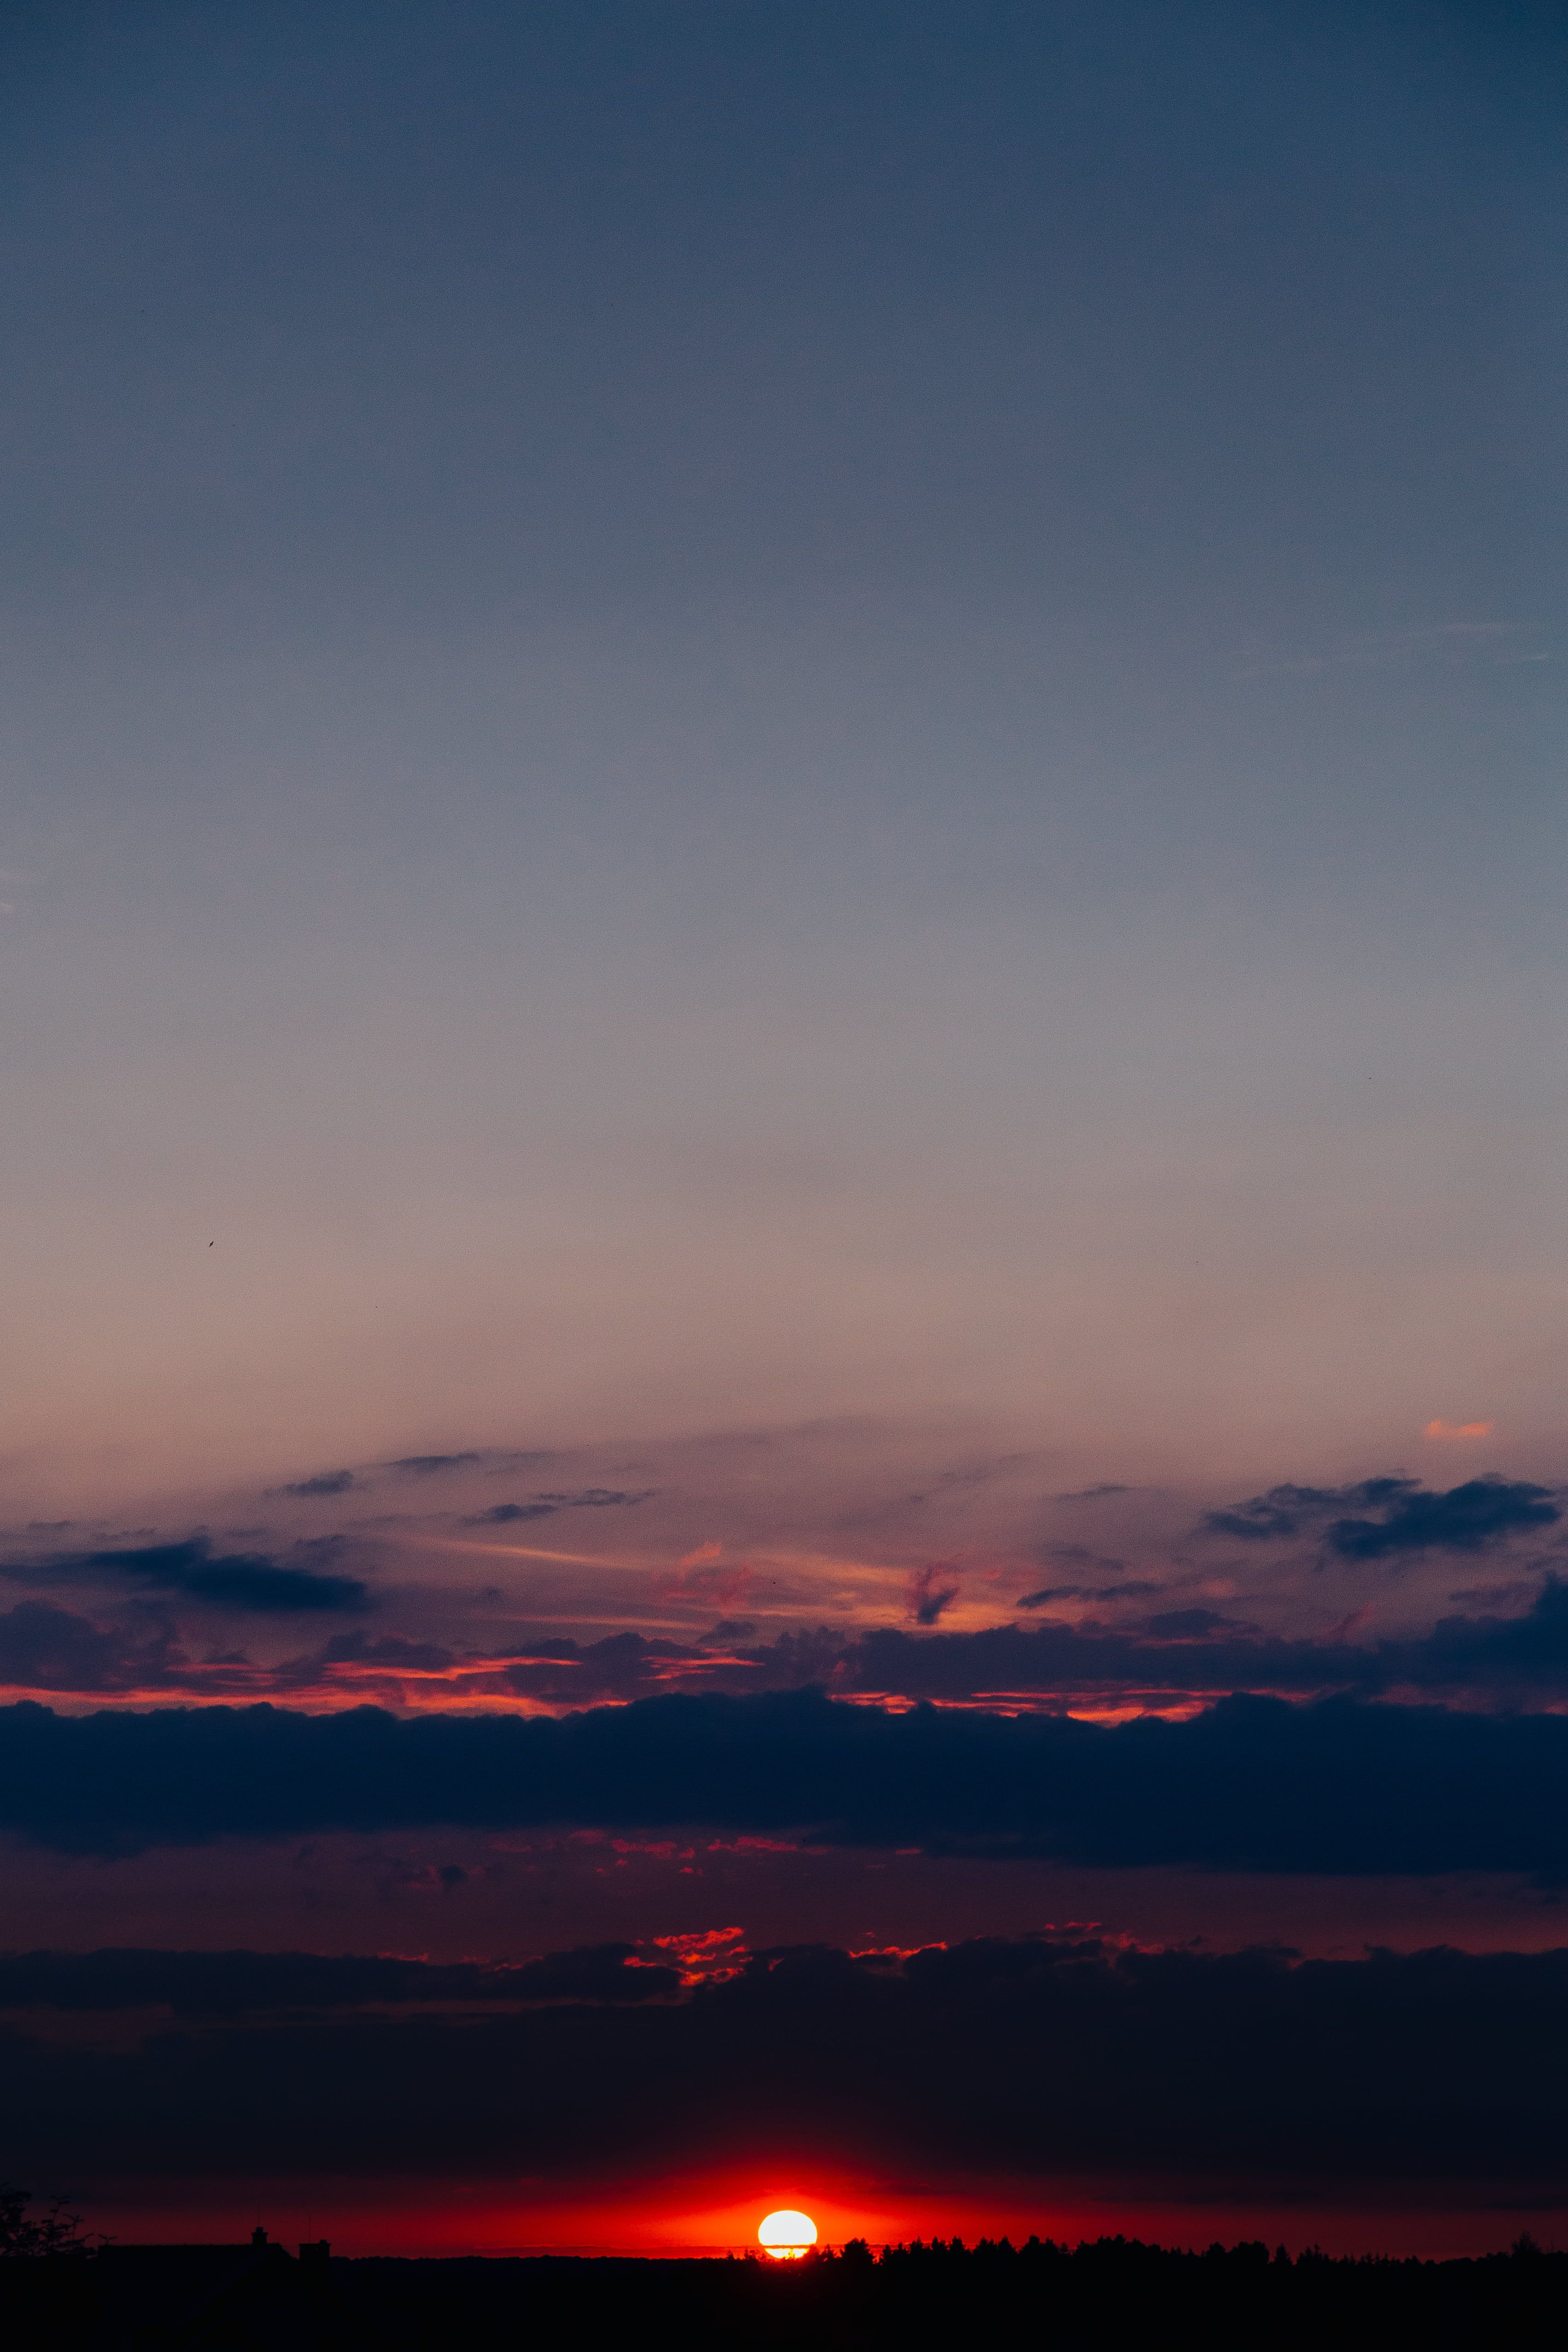 Sky Sunrise Sunset Twilight Whitespace Nature Dusk Cloud Sky Blue Weather Scenics 4k Wallpaper Hdwallpaper Desktop Sky Aesthetic Sky Clouds Hd wallpaper sky clouds sunset dusk